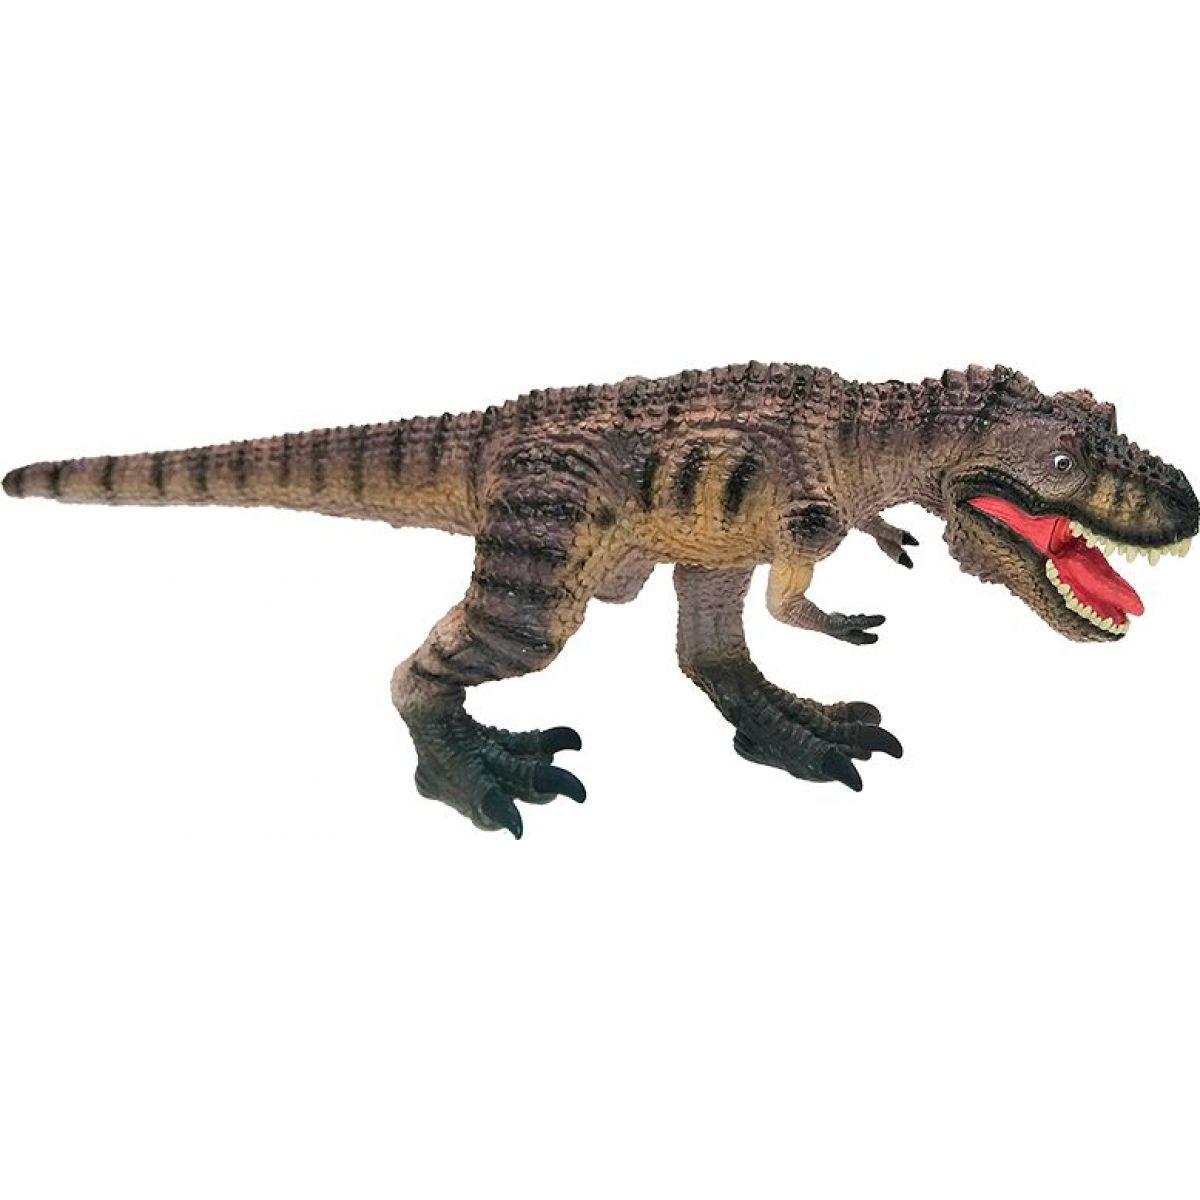 Hm Studio Tyranosaurus 120 cm